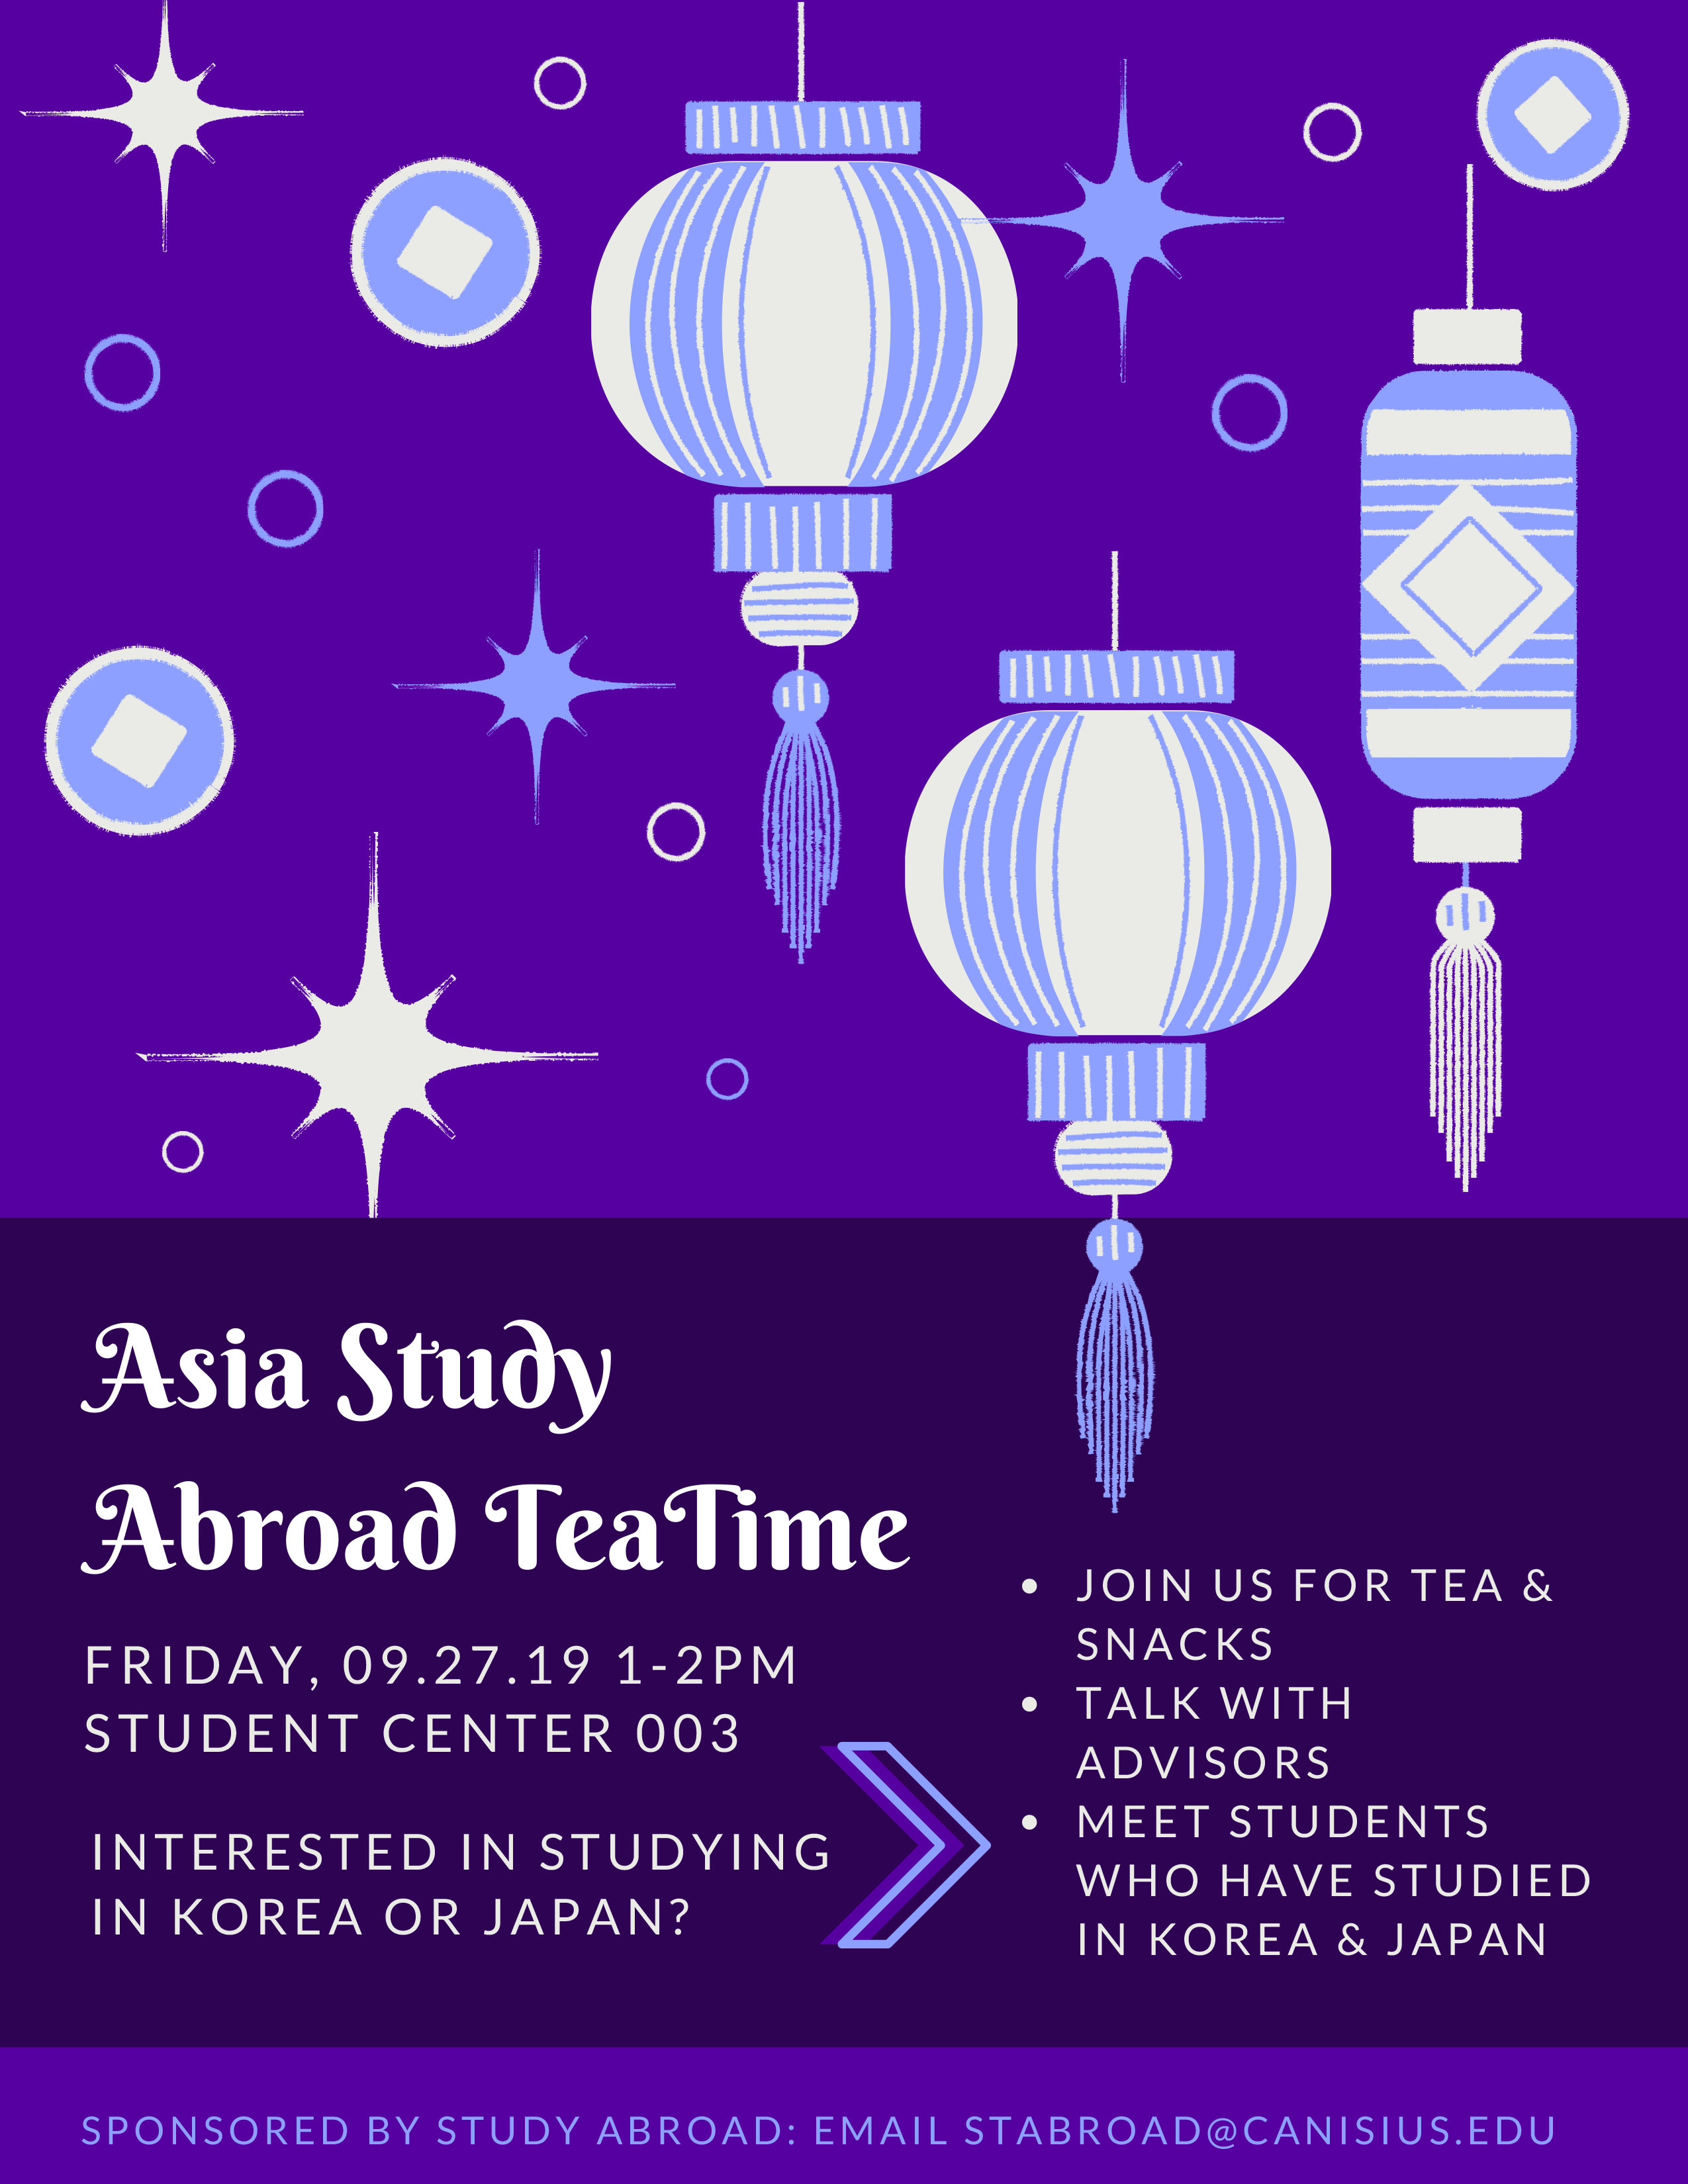 Asia Study Abroad TeaTime.jpg